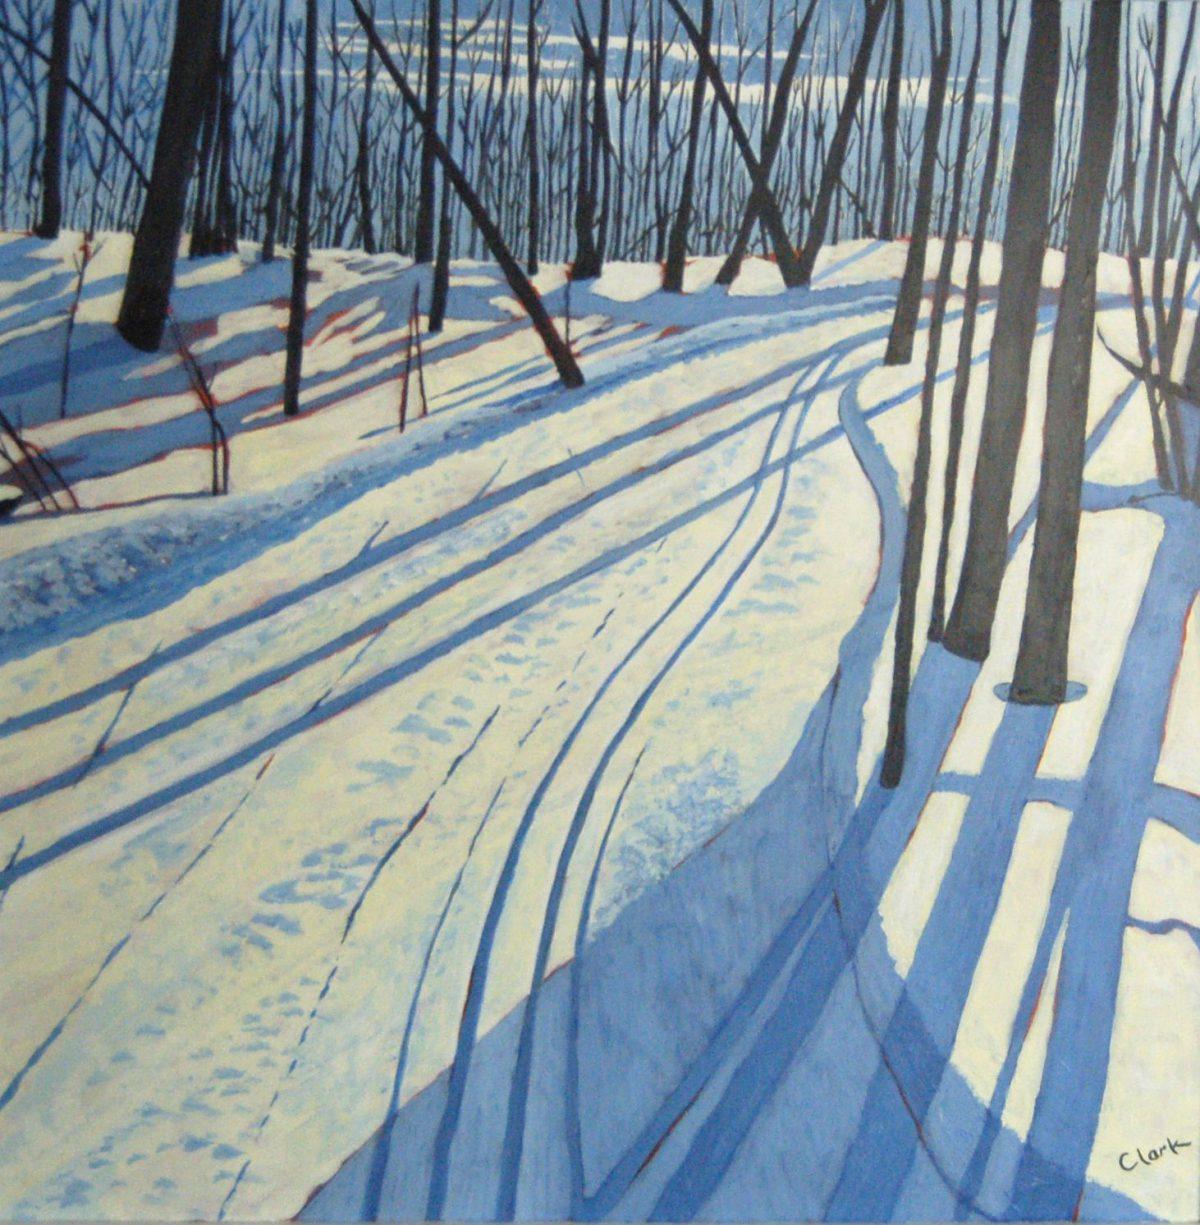 Winter Trails by Bev Clark